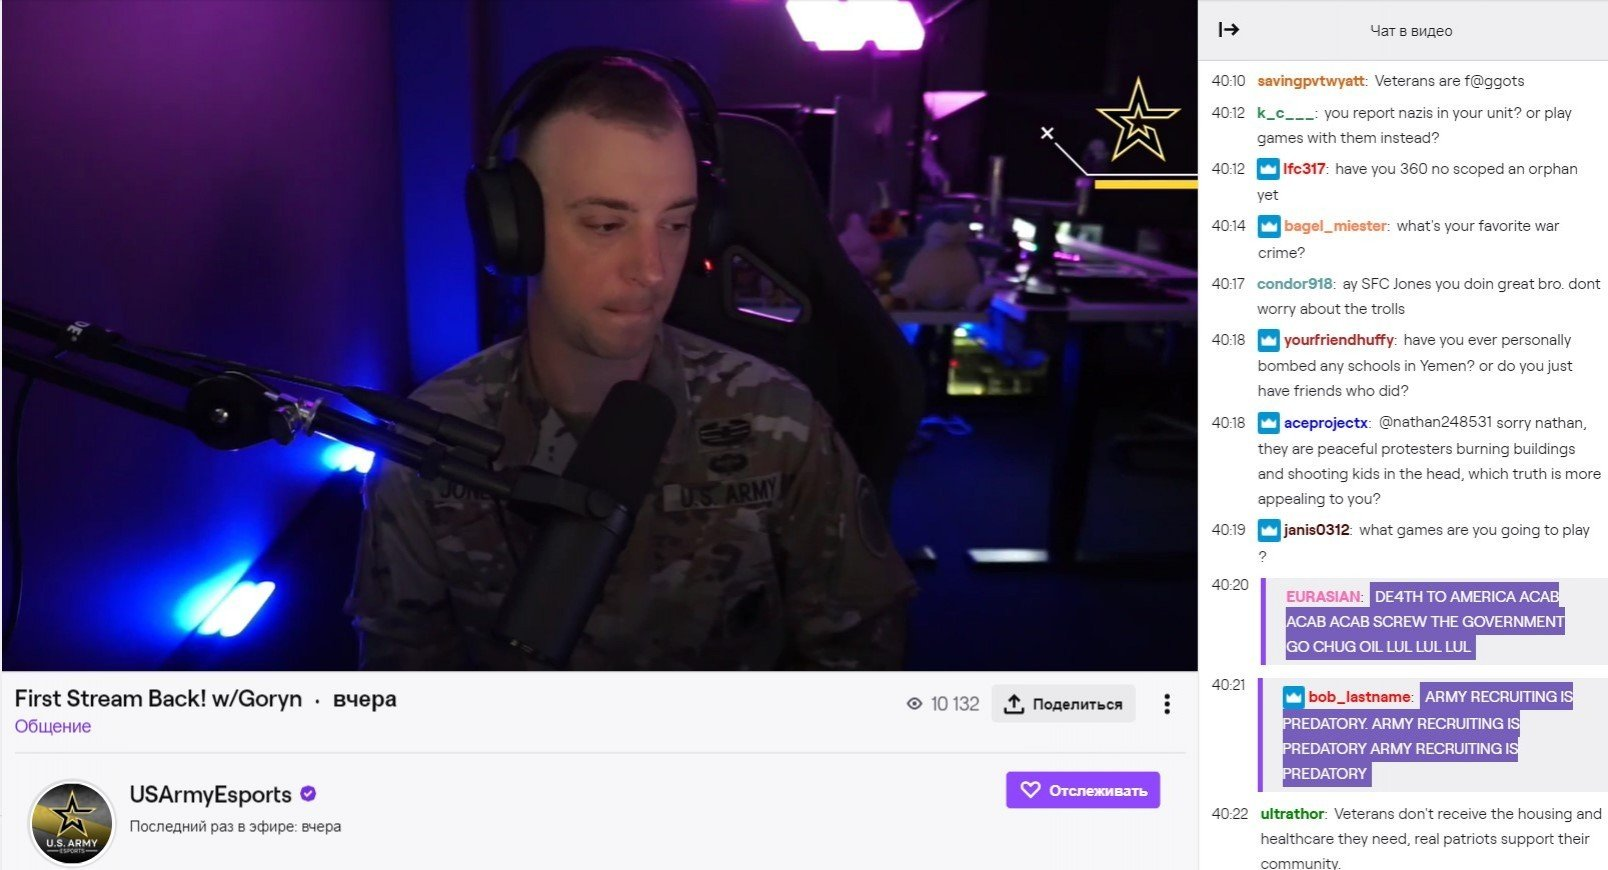 Армия США снова стримит на Twitch чат оскорбляет военных но закон на стороне чата